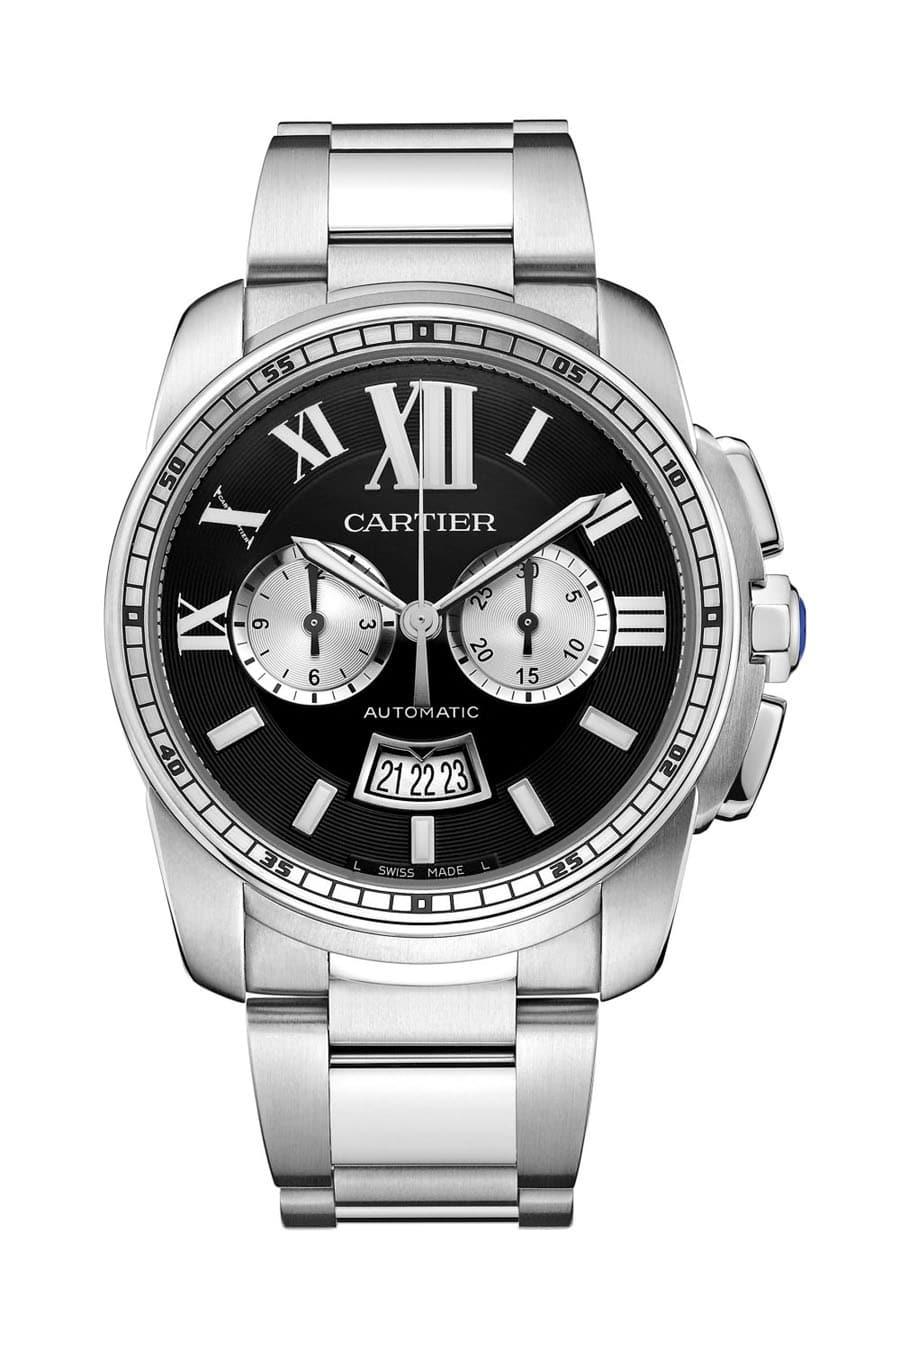 Cartier: Calibre de Cartier Chronograph